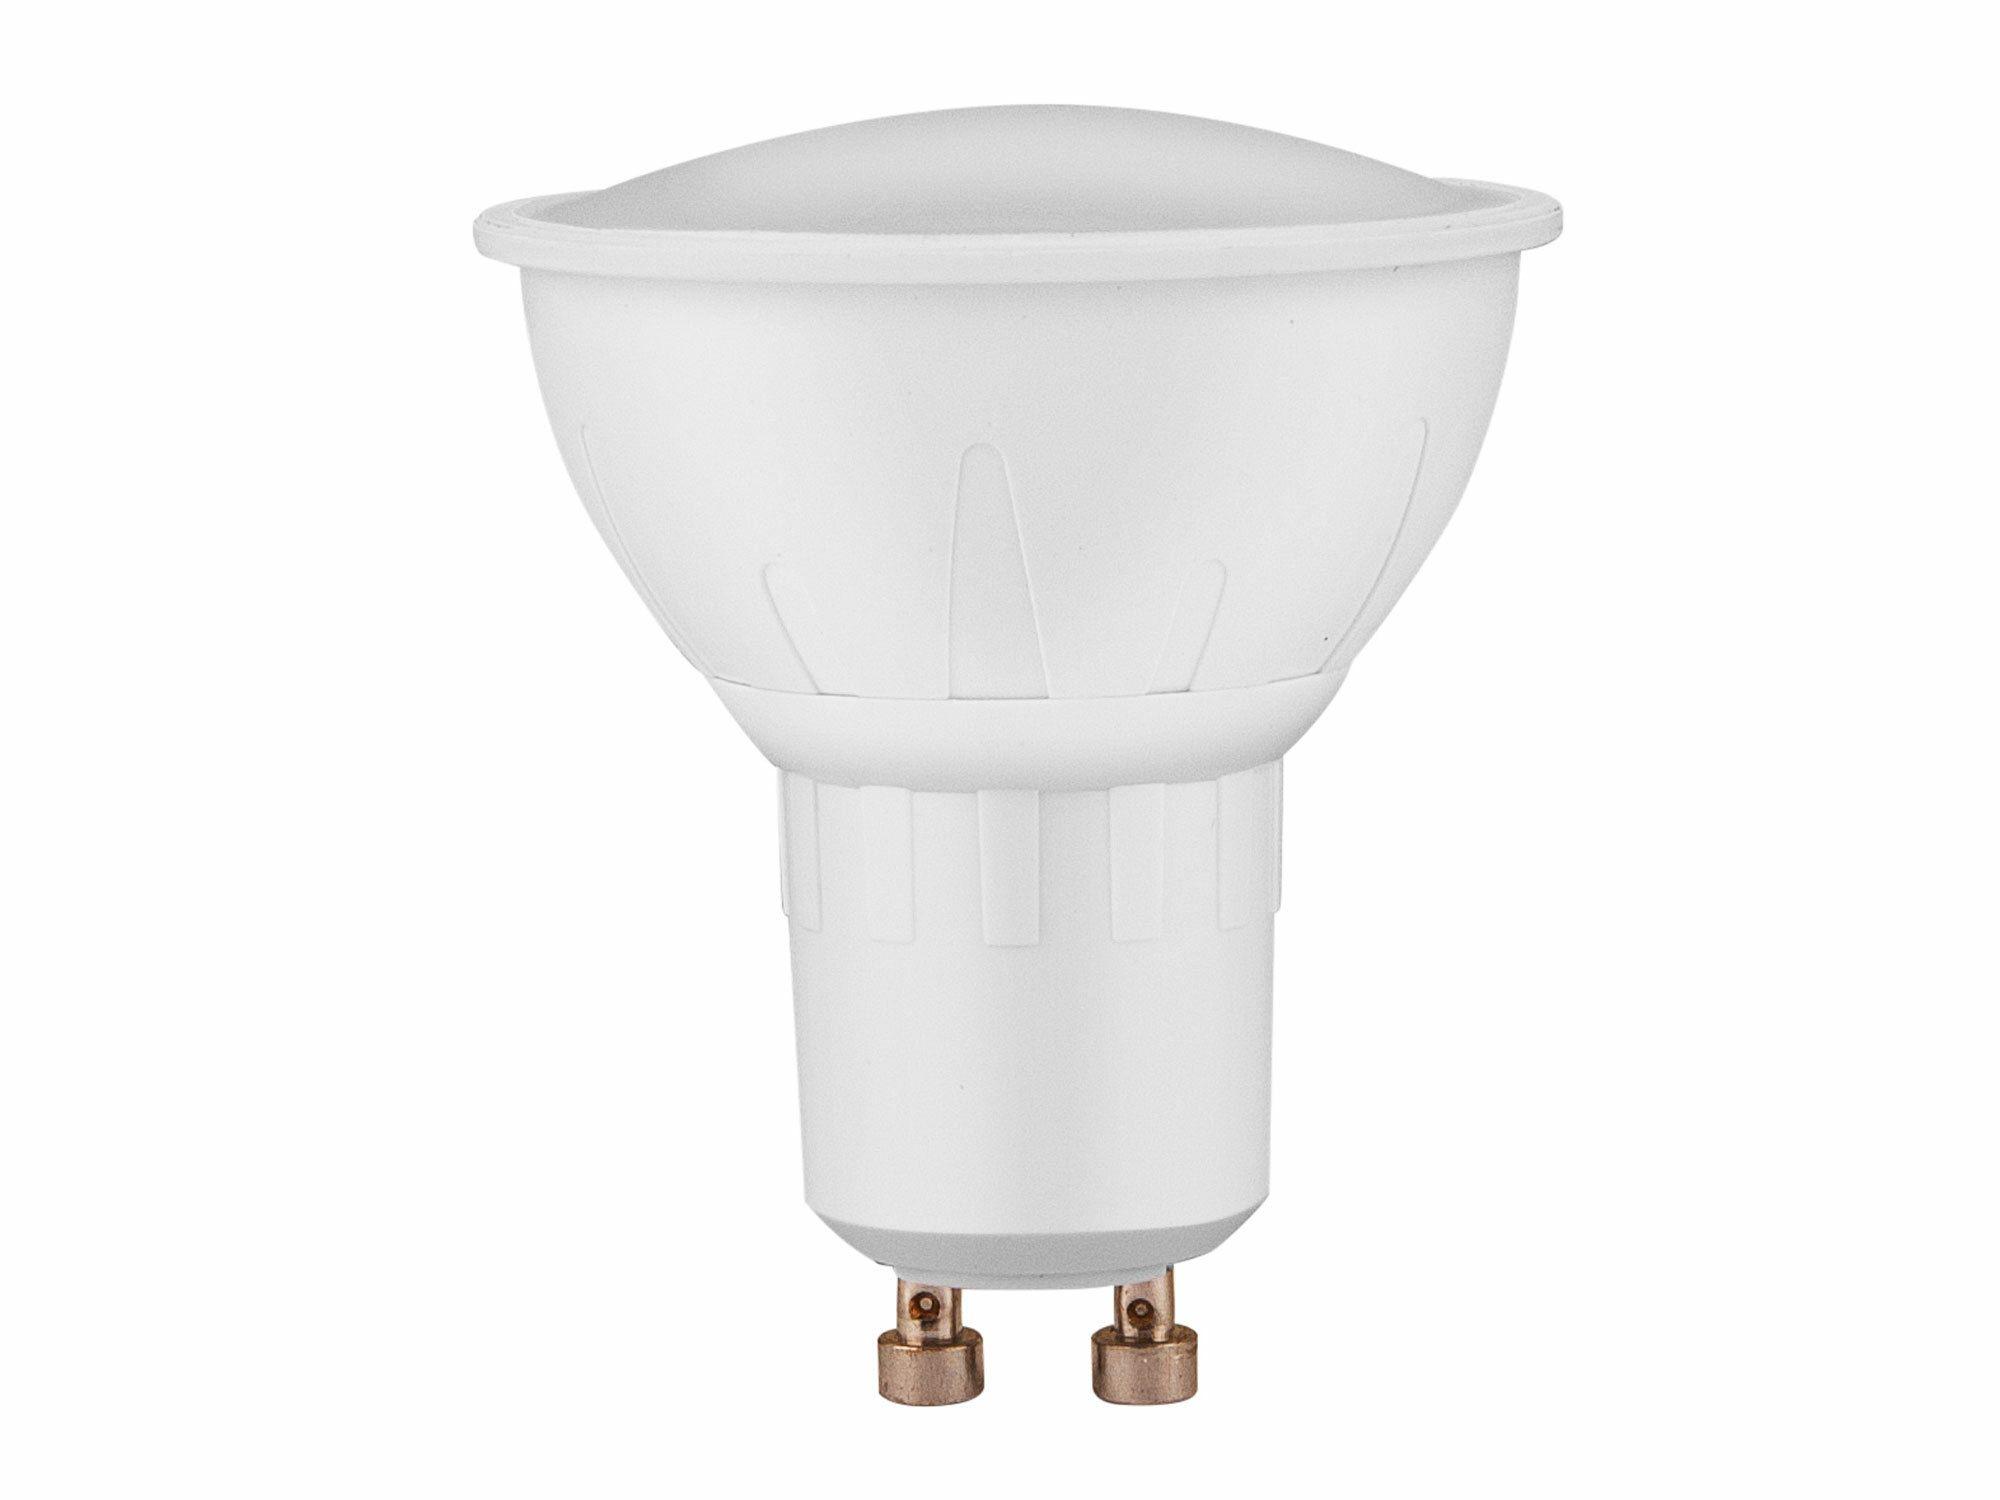 Žárovka LED reflektorová, 6W, 470lm, GU10, denní bílá, EXTOL LIGHT